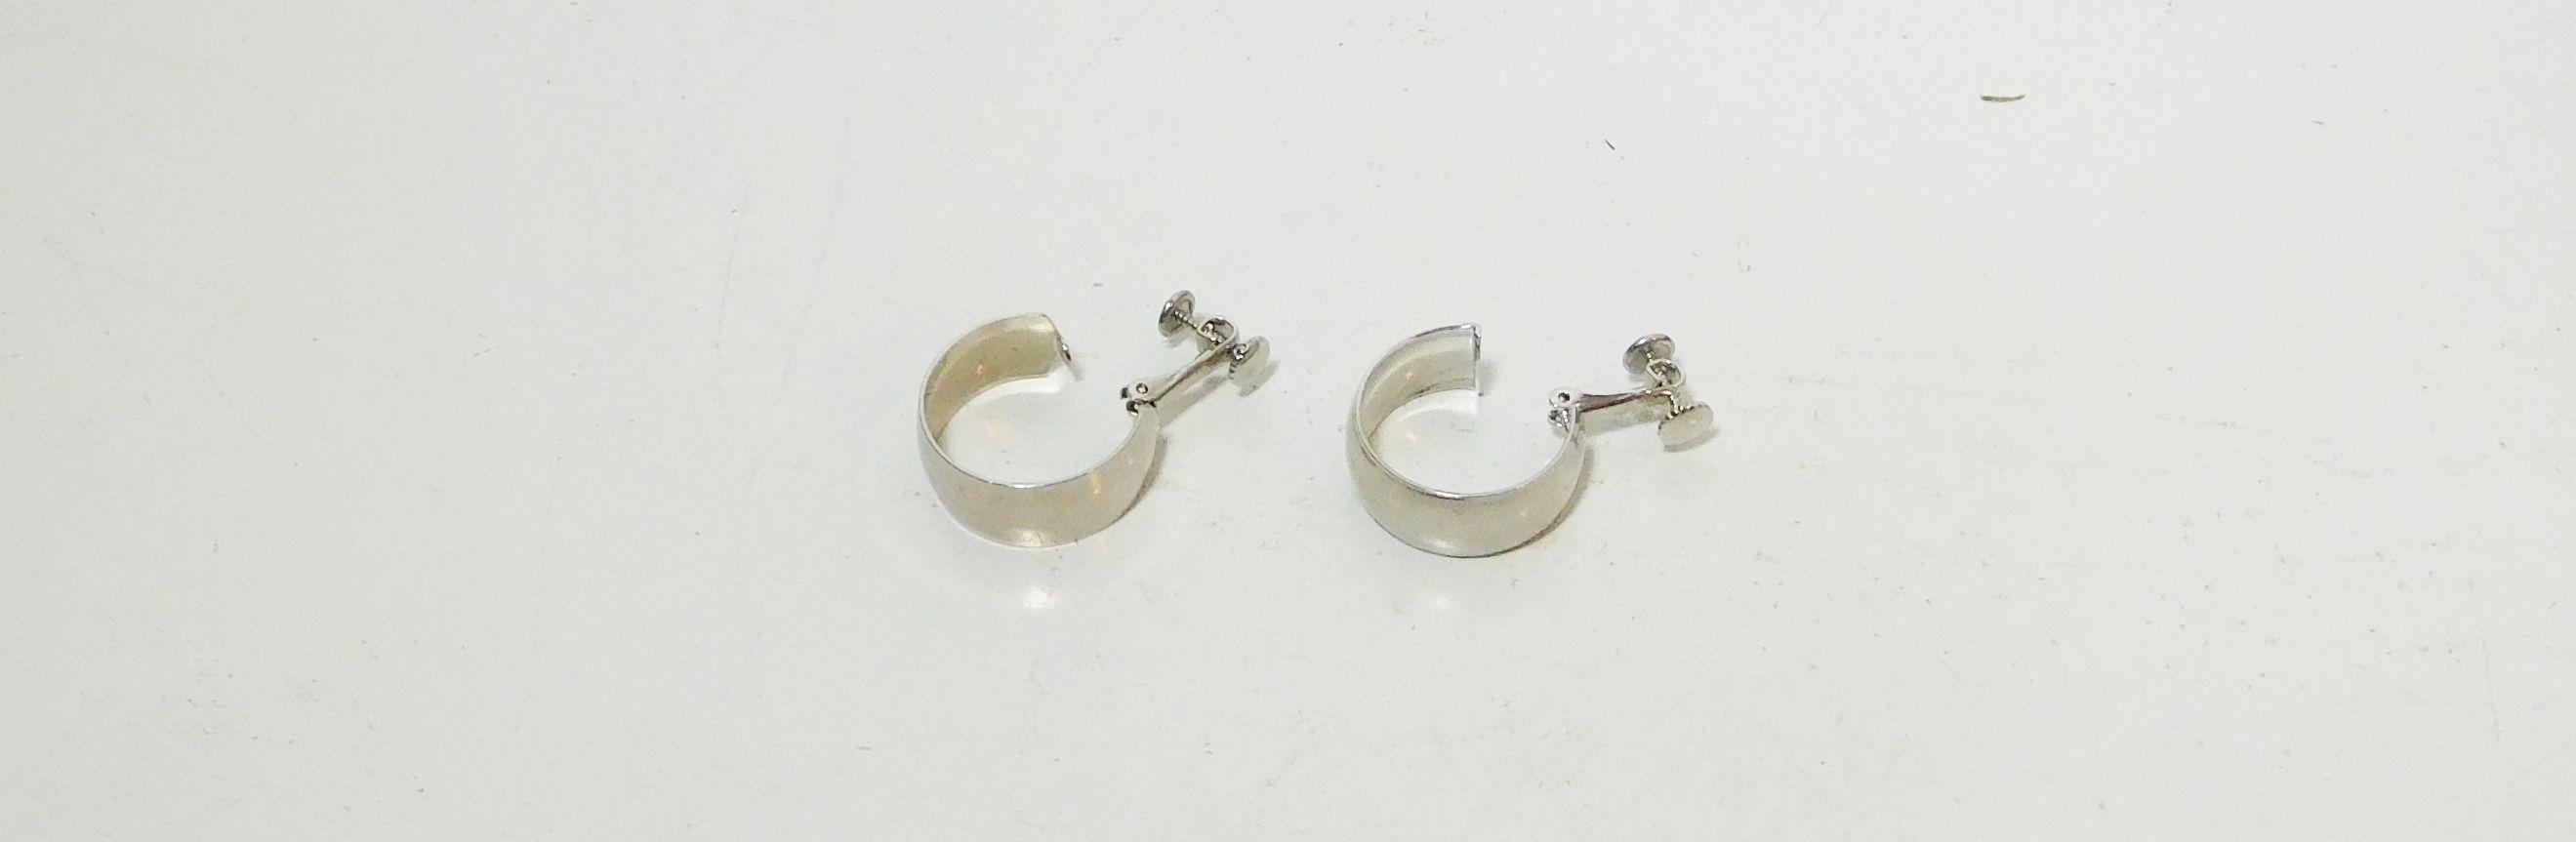 Small Wide Silver Tone Clip On Back Hoop Earrings